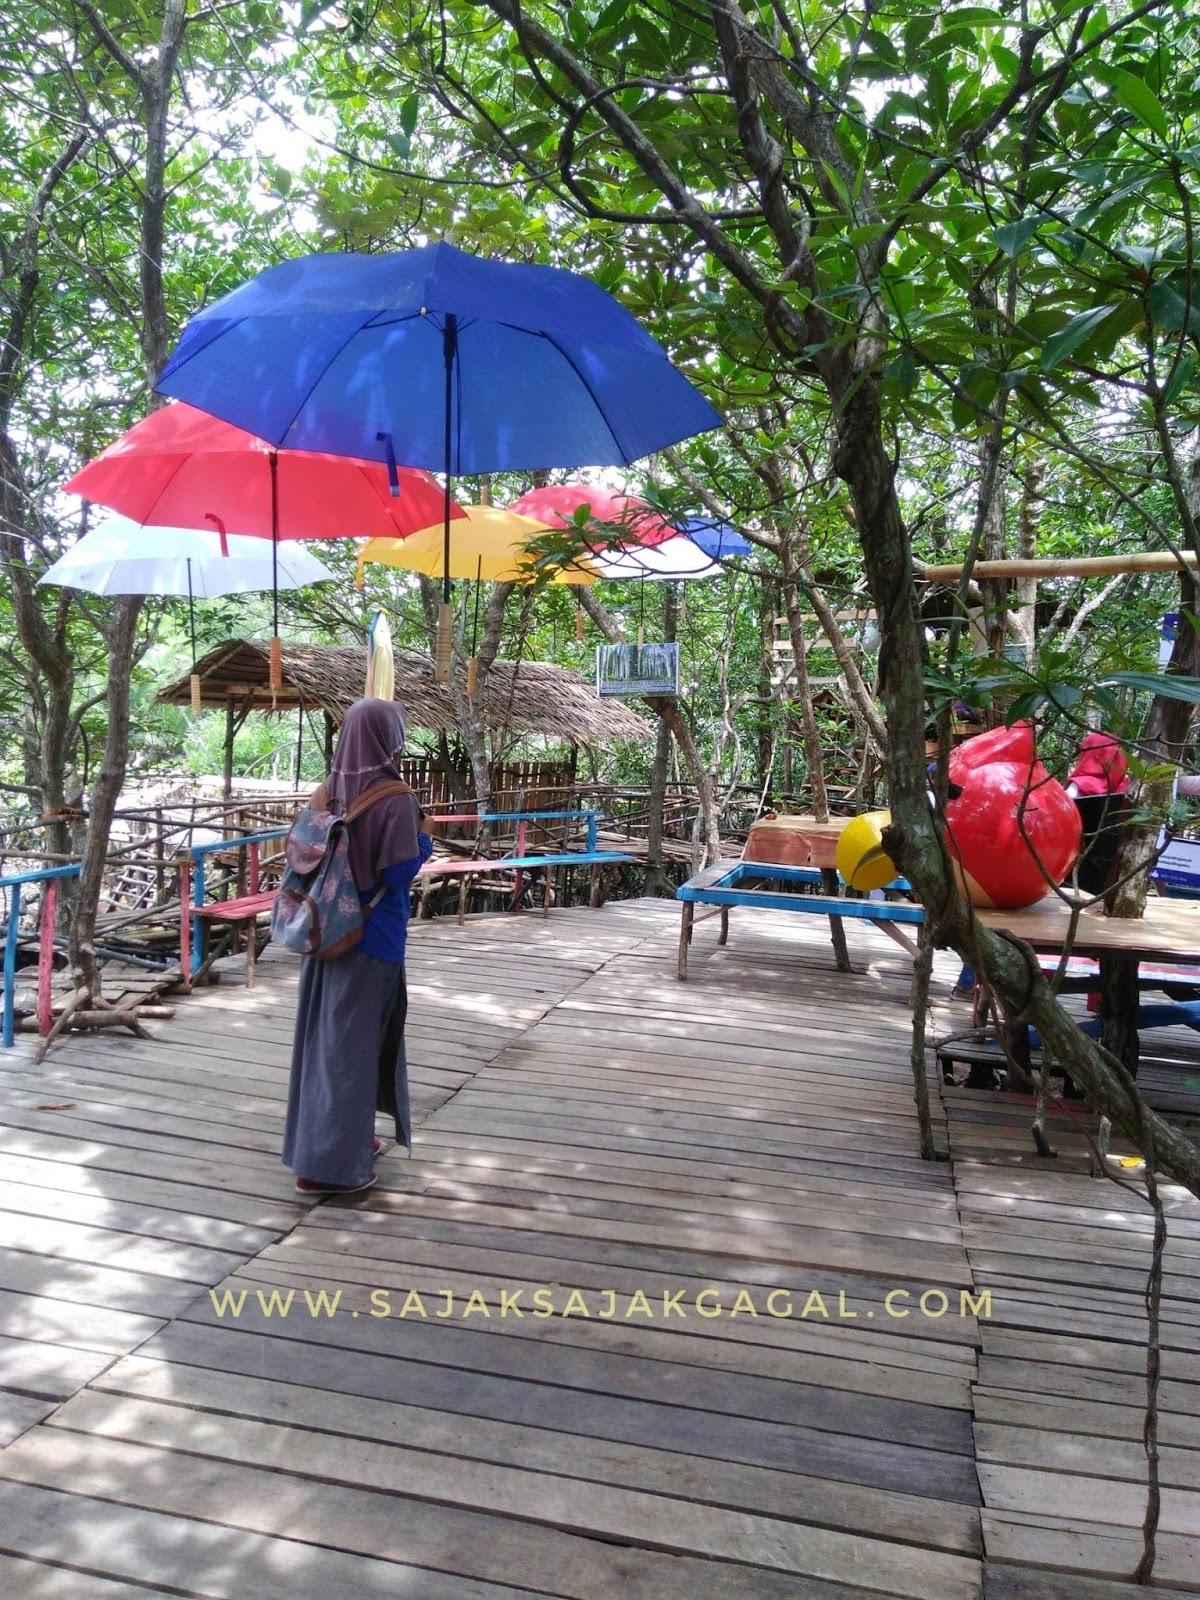 Nyantai Taman Pantai Berkas Bengkulu Yuk Blog Junita Susanti Wisata